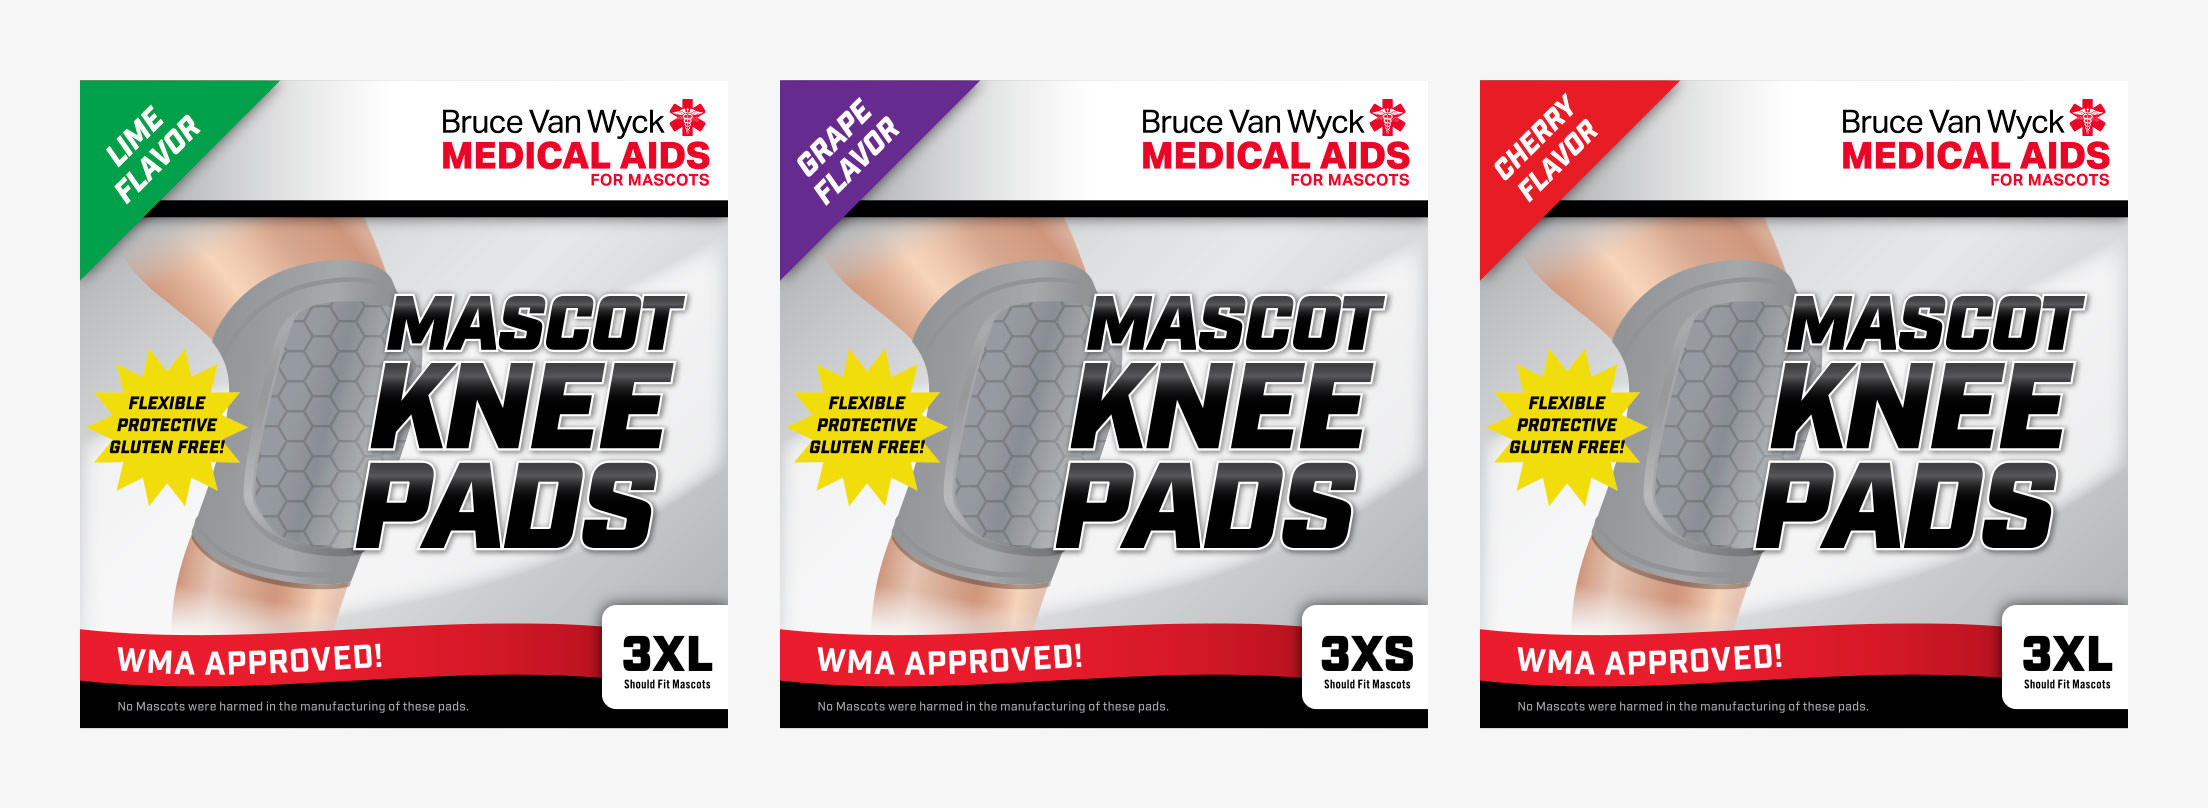 Mascots: Packaging Knee Pads